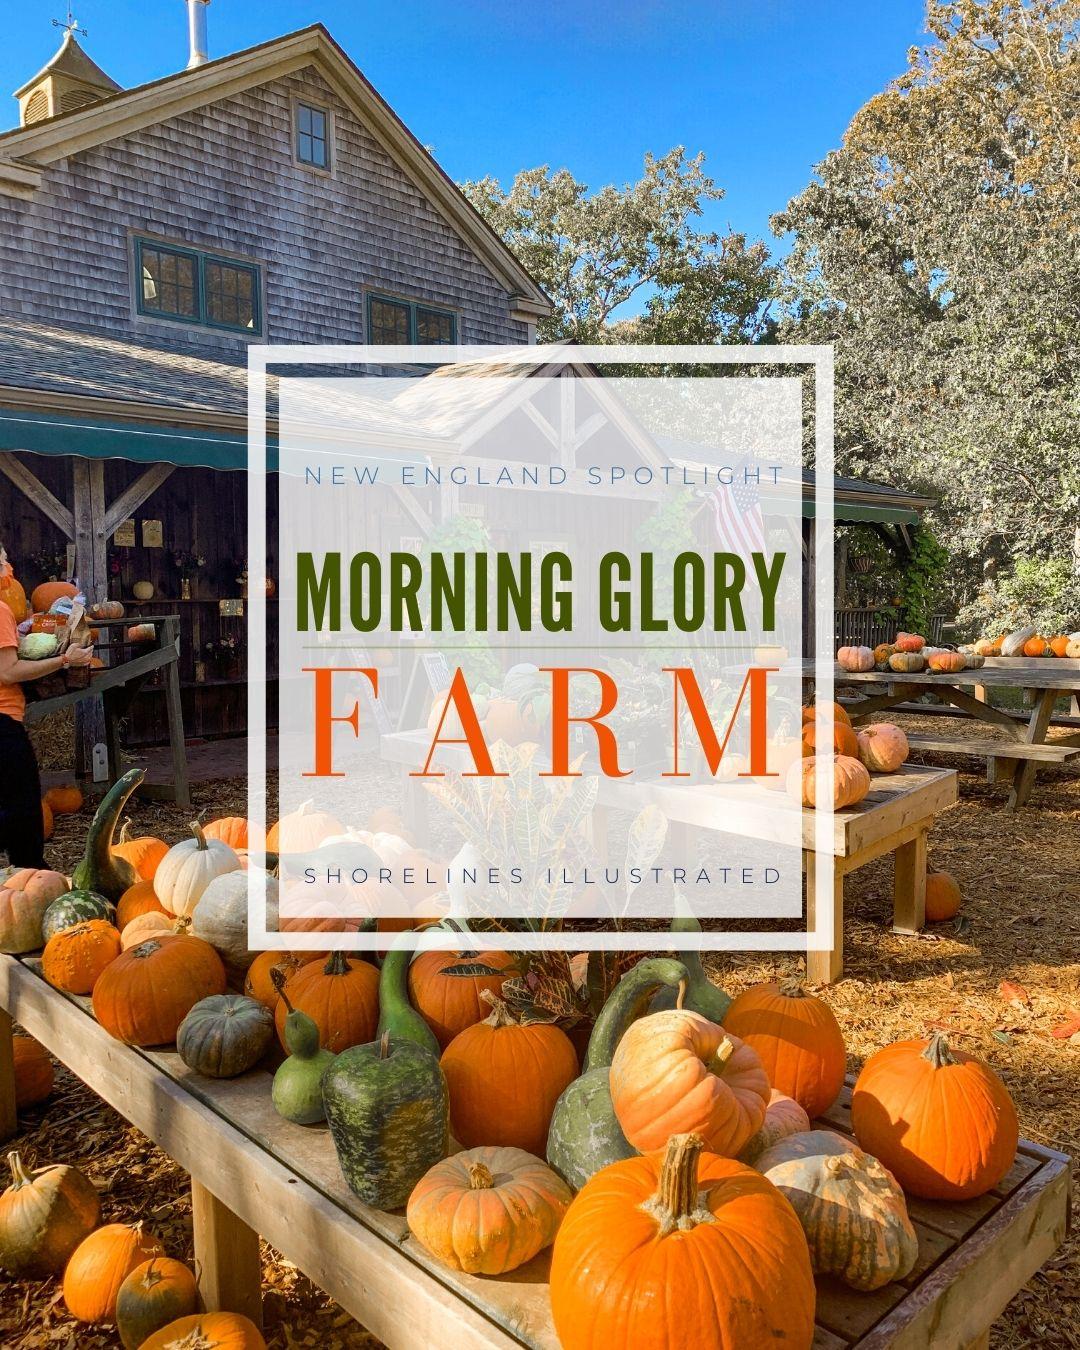 Morning Glory Farm Marthas Vineyard-1